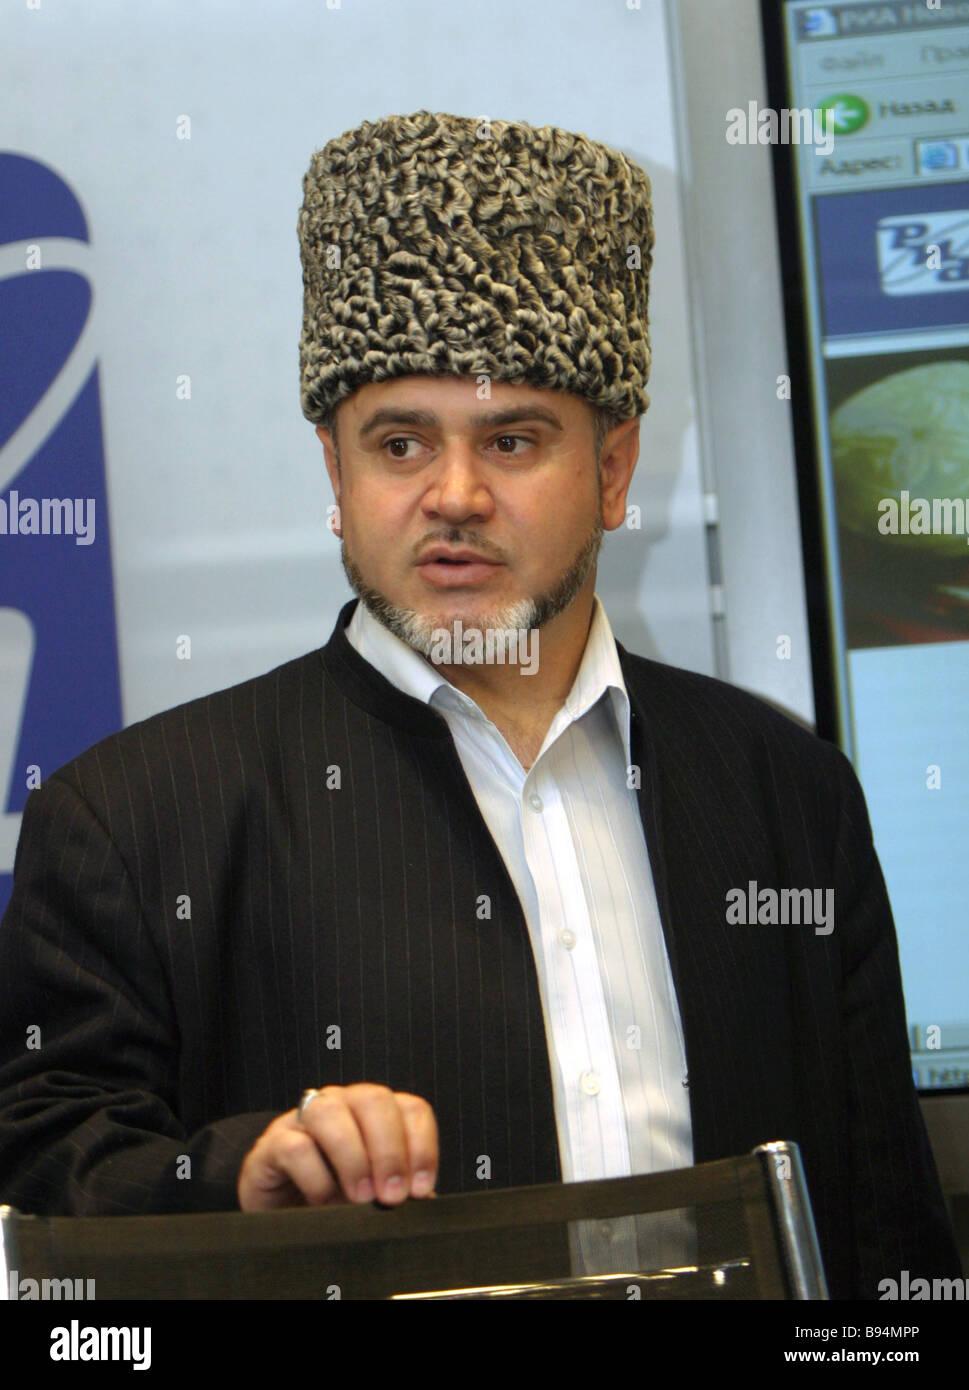 Mufti Shafig haji Pshikhachev Al Hak all Russia league Supreme Council member International Islamic Mission Executive - Stock Image